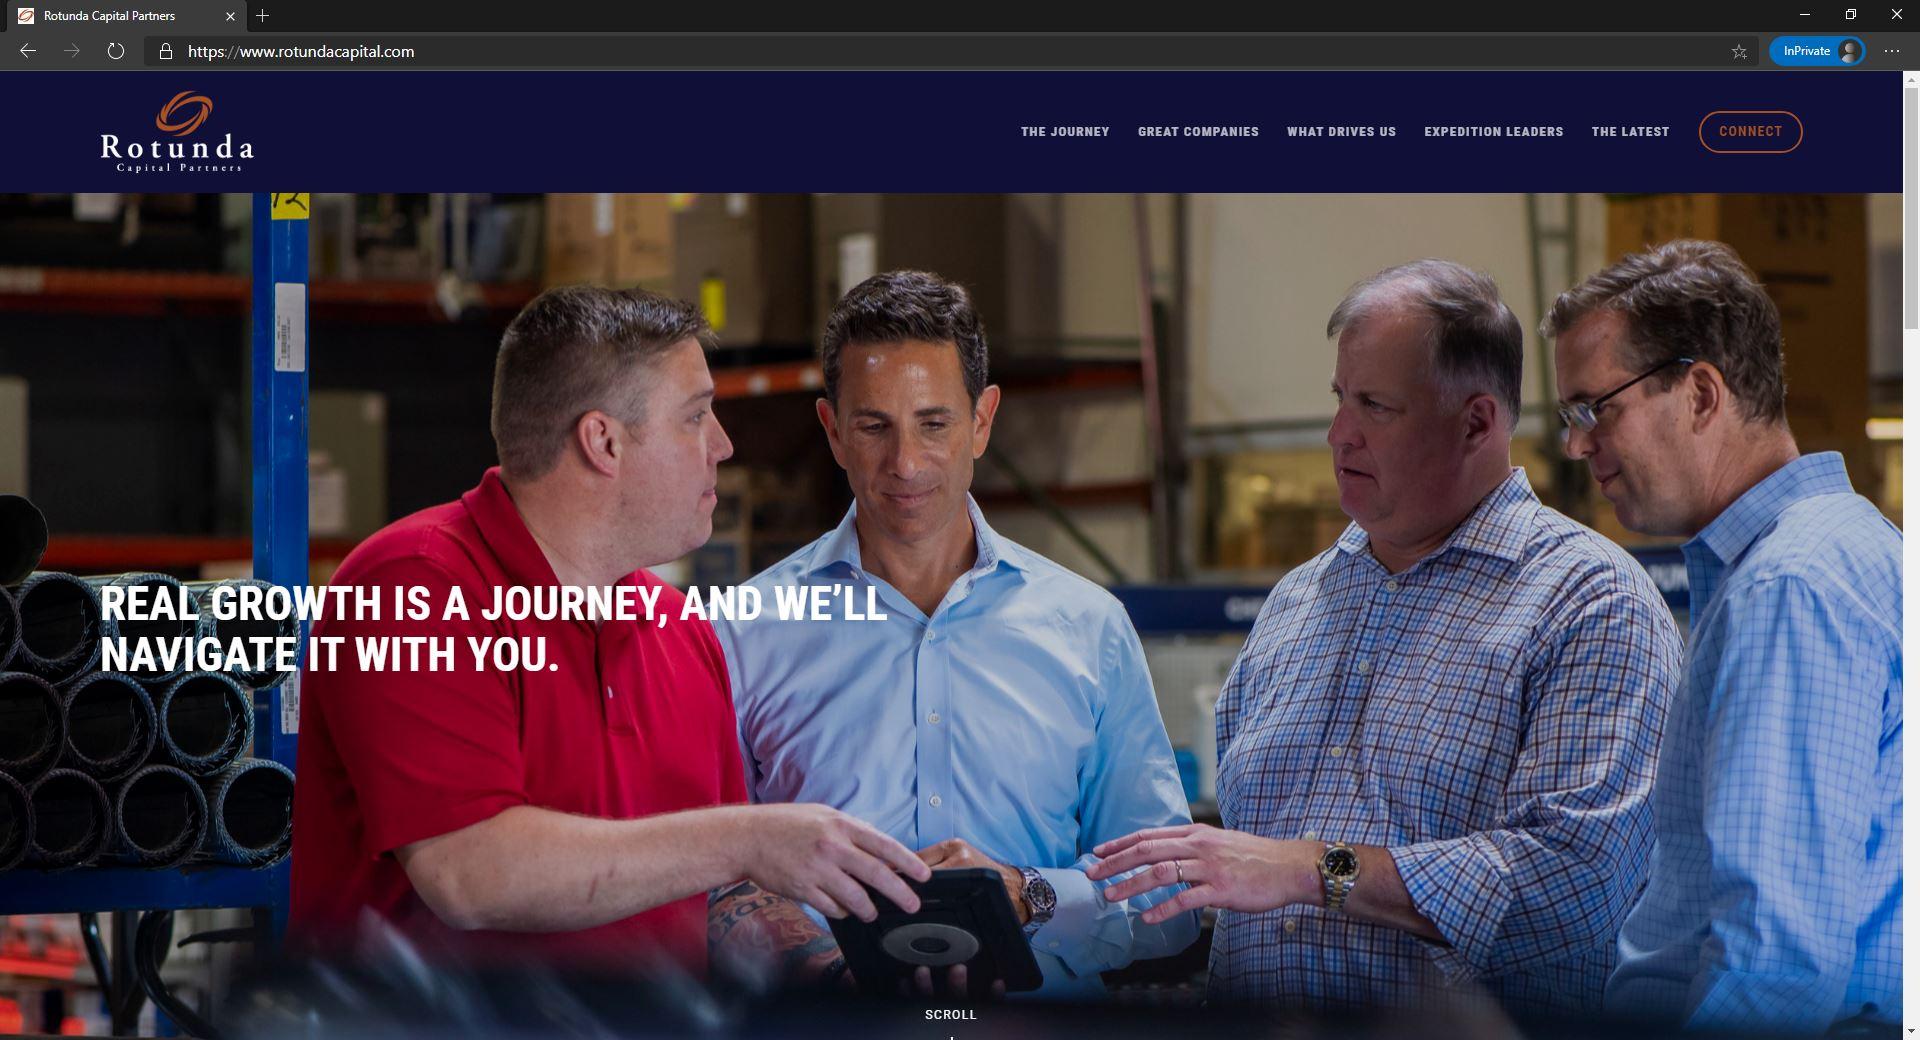 Rotunda Capital Partners website